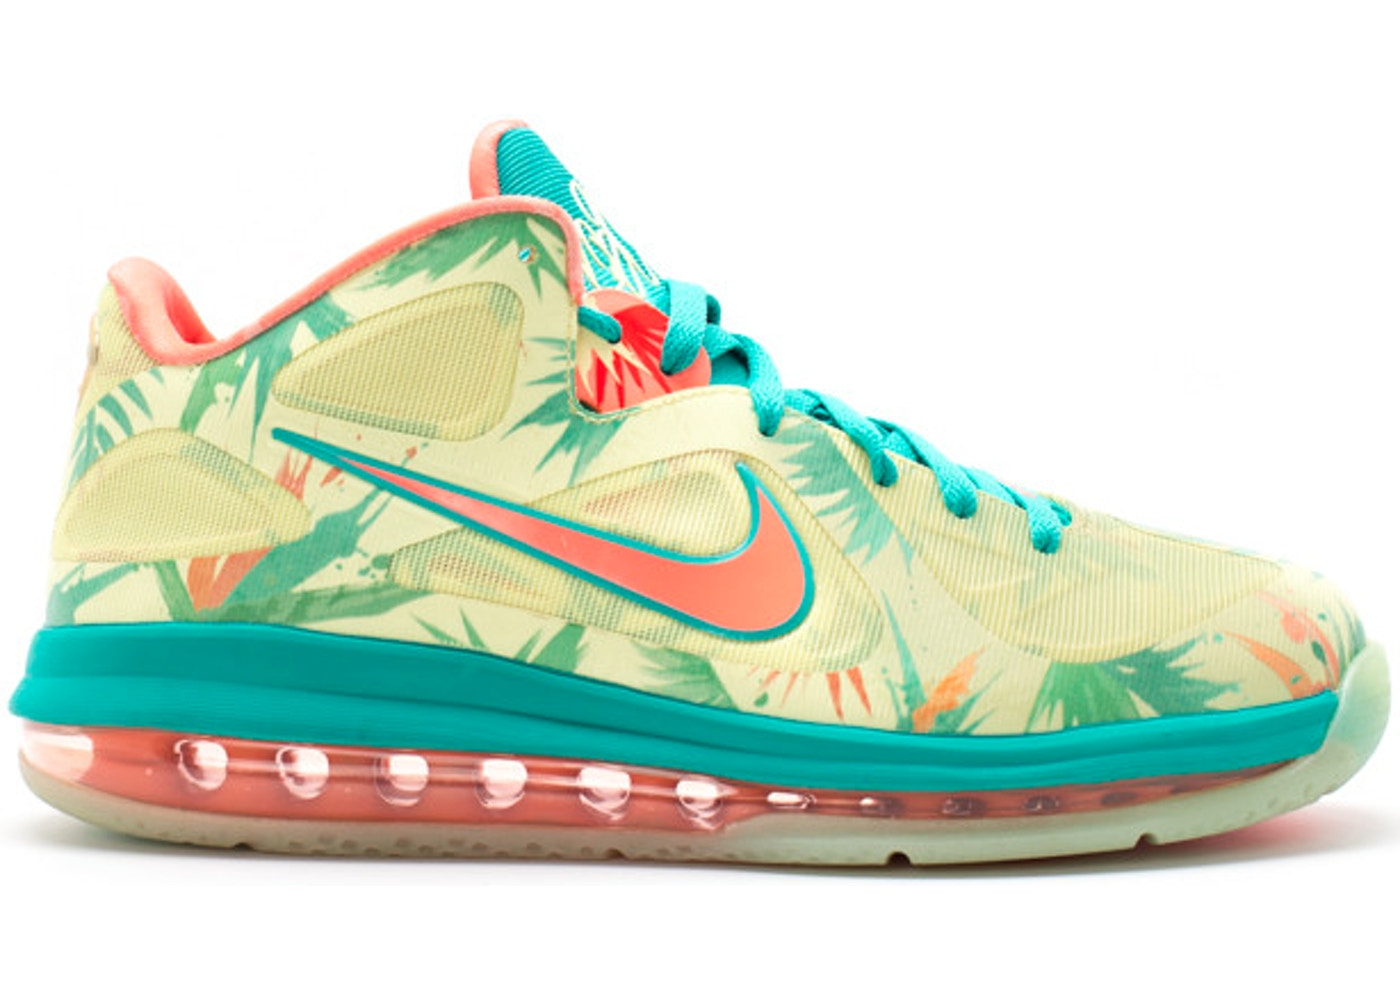 wholesale dealer 46547 37c30 Nike LeBron Shoes - Average Sale Price